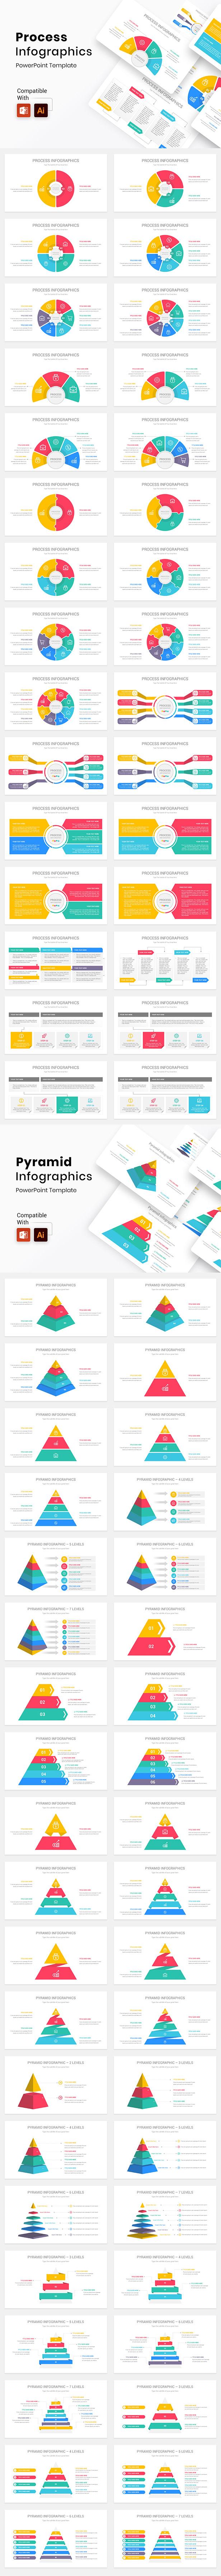 Slide Deck - Multipurpose PowerPoint Template - 11